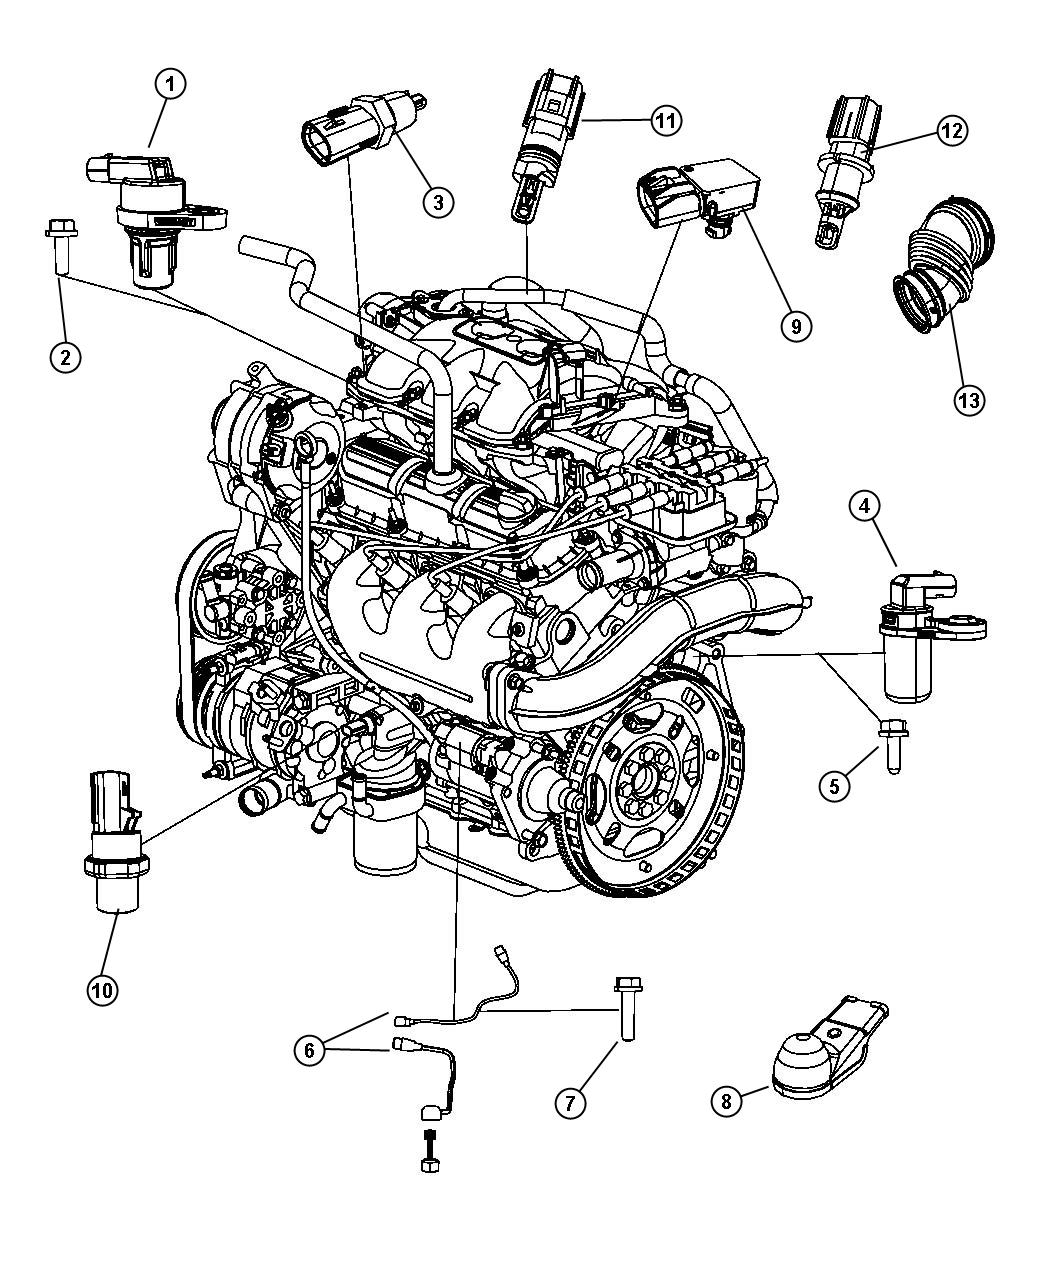 97 chrysler sebring wiring diagram